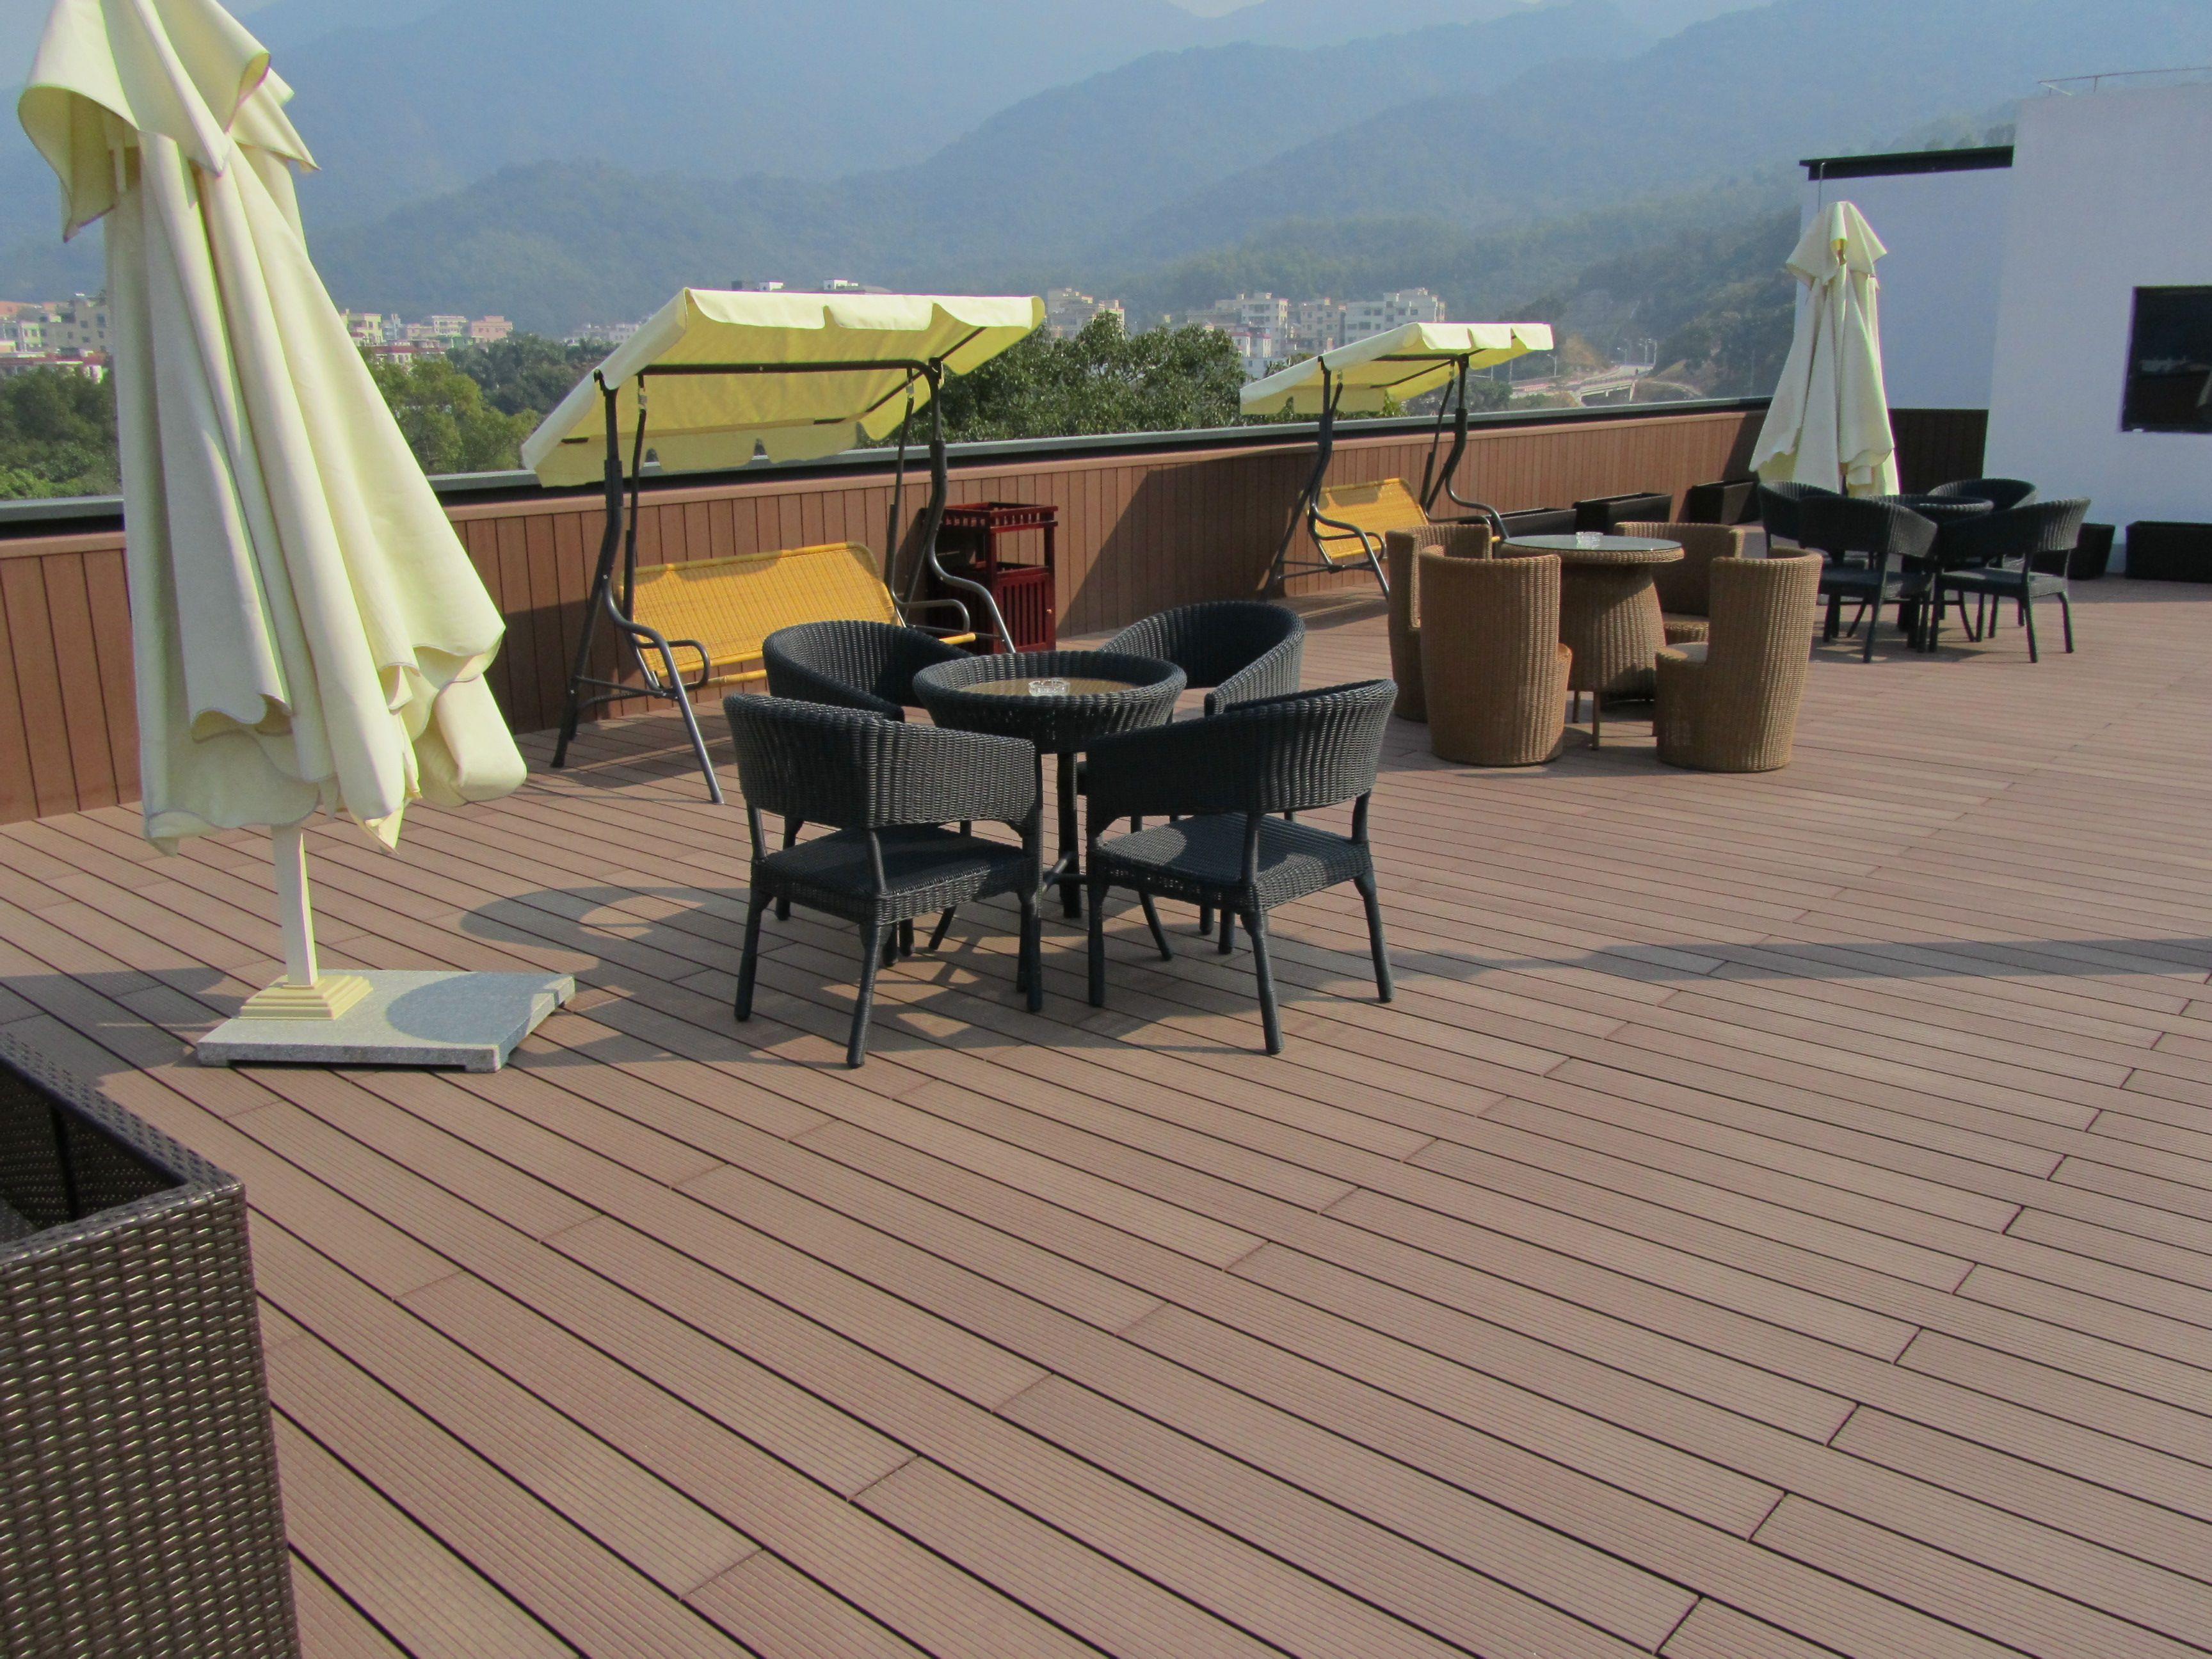 Composite vs pressure treated decks kenya nakuru discount for Cost of composite decking vs pressure treated